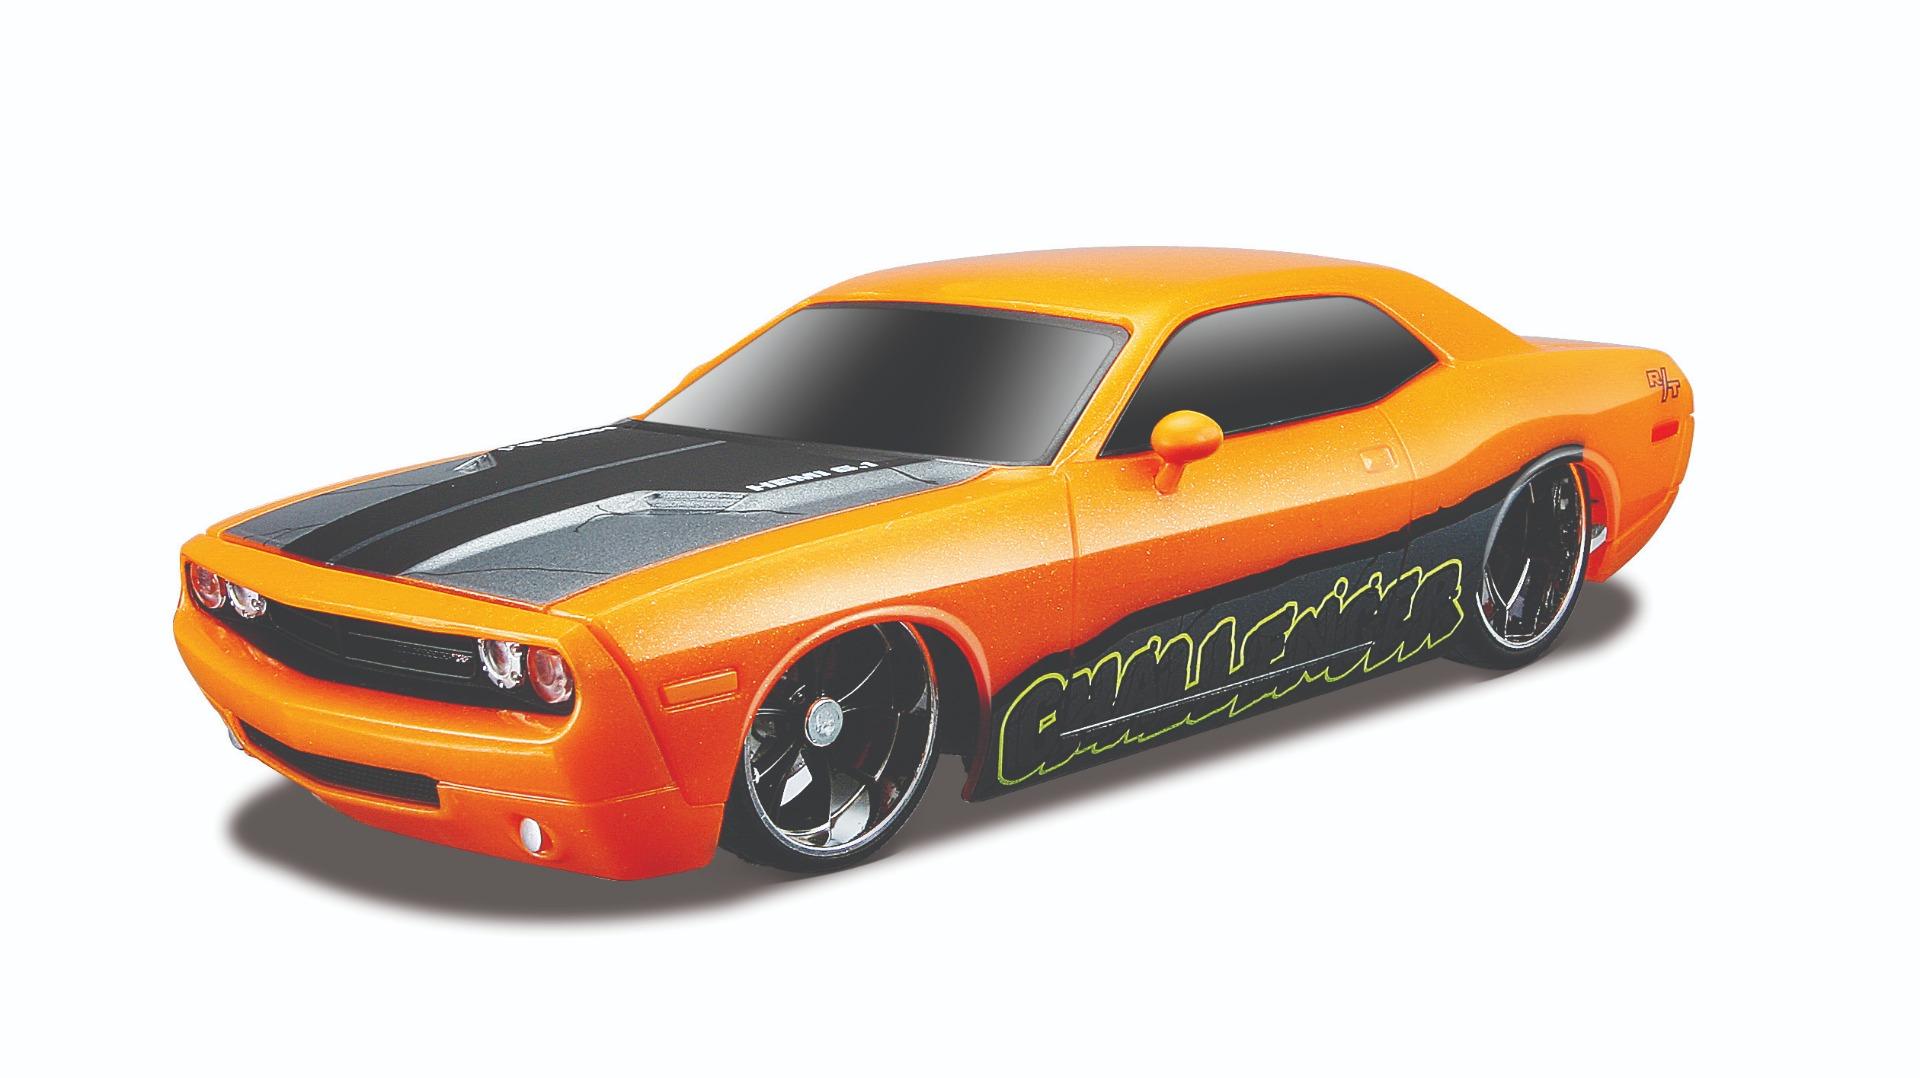 Masinuta Maisto Dodge Challenger Concept Rc, 2006, 1:24